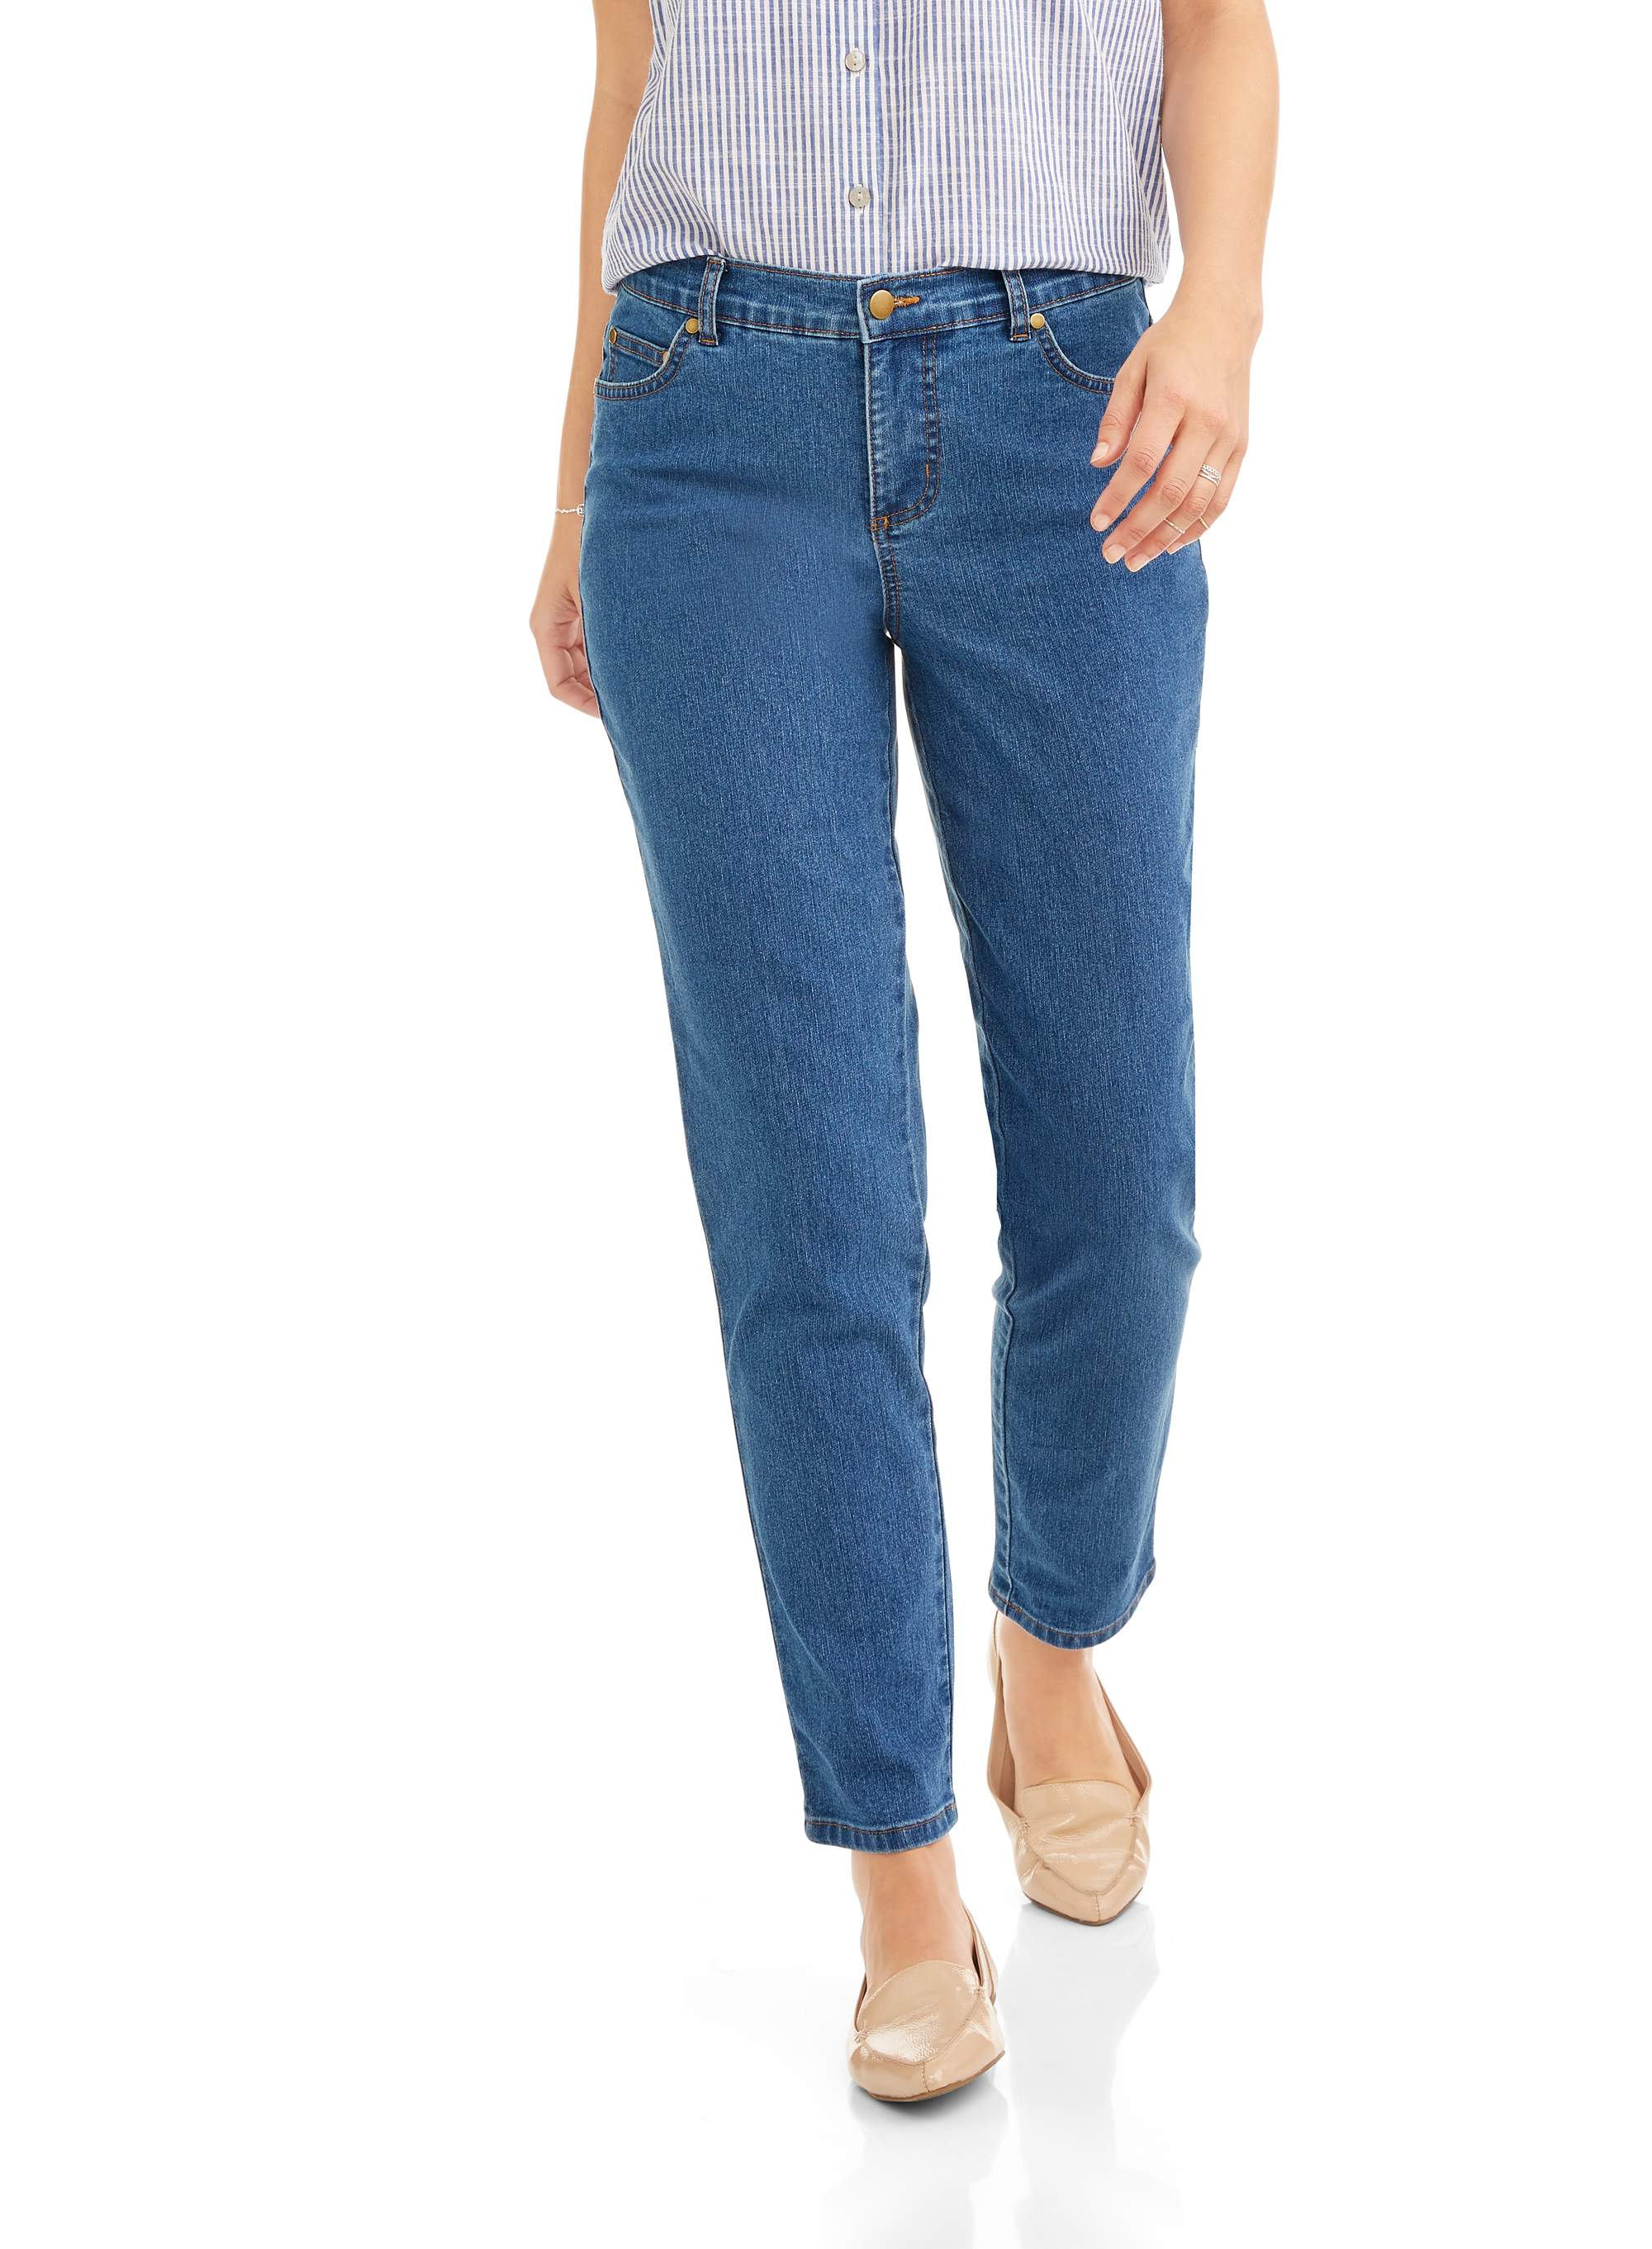 Women's Stretch Denim 5-Pocket Jeans with Back Elastic